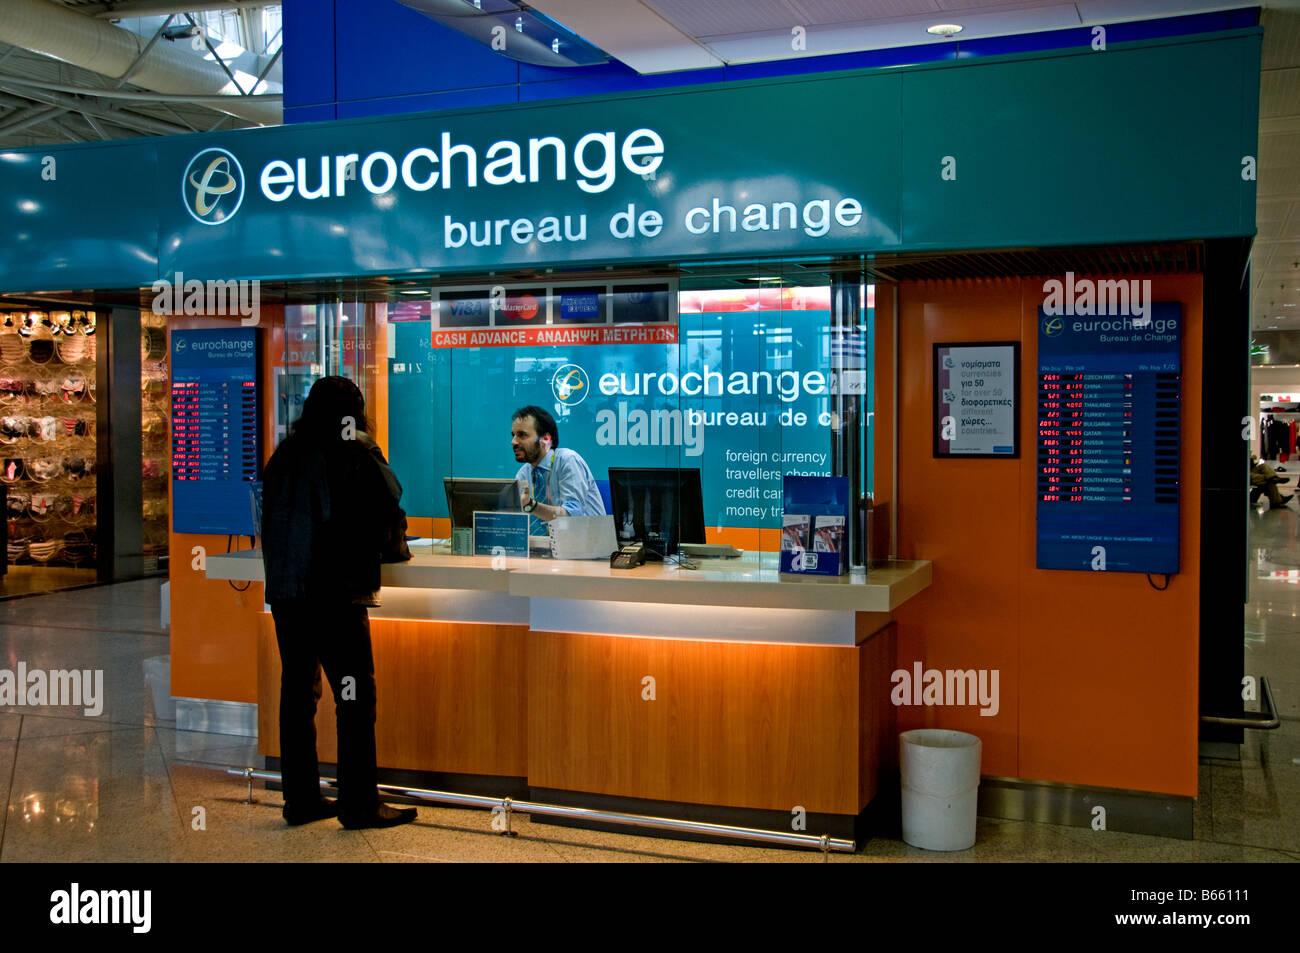 Athens international airport stock photos athens international airport stock images alamy - Bureau de change euro dollar paris ...